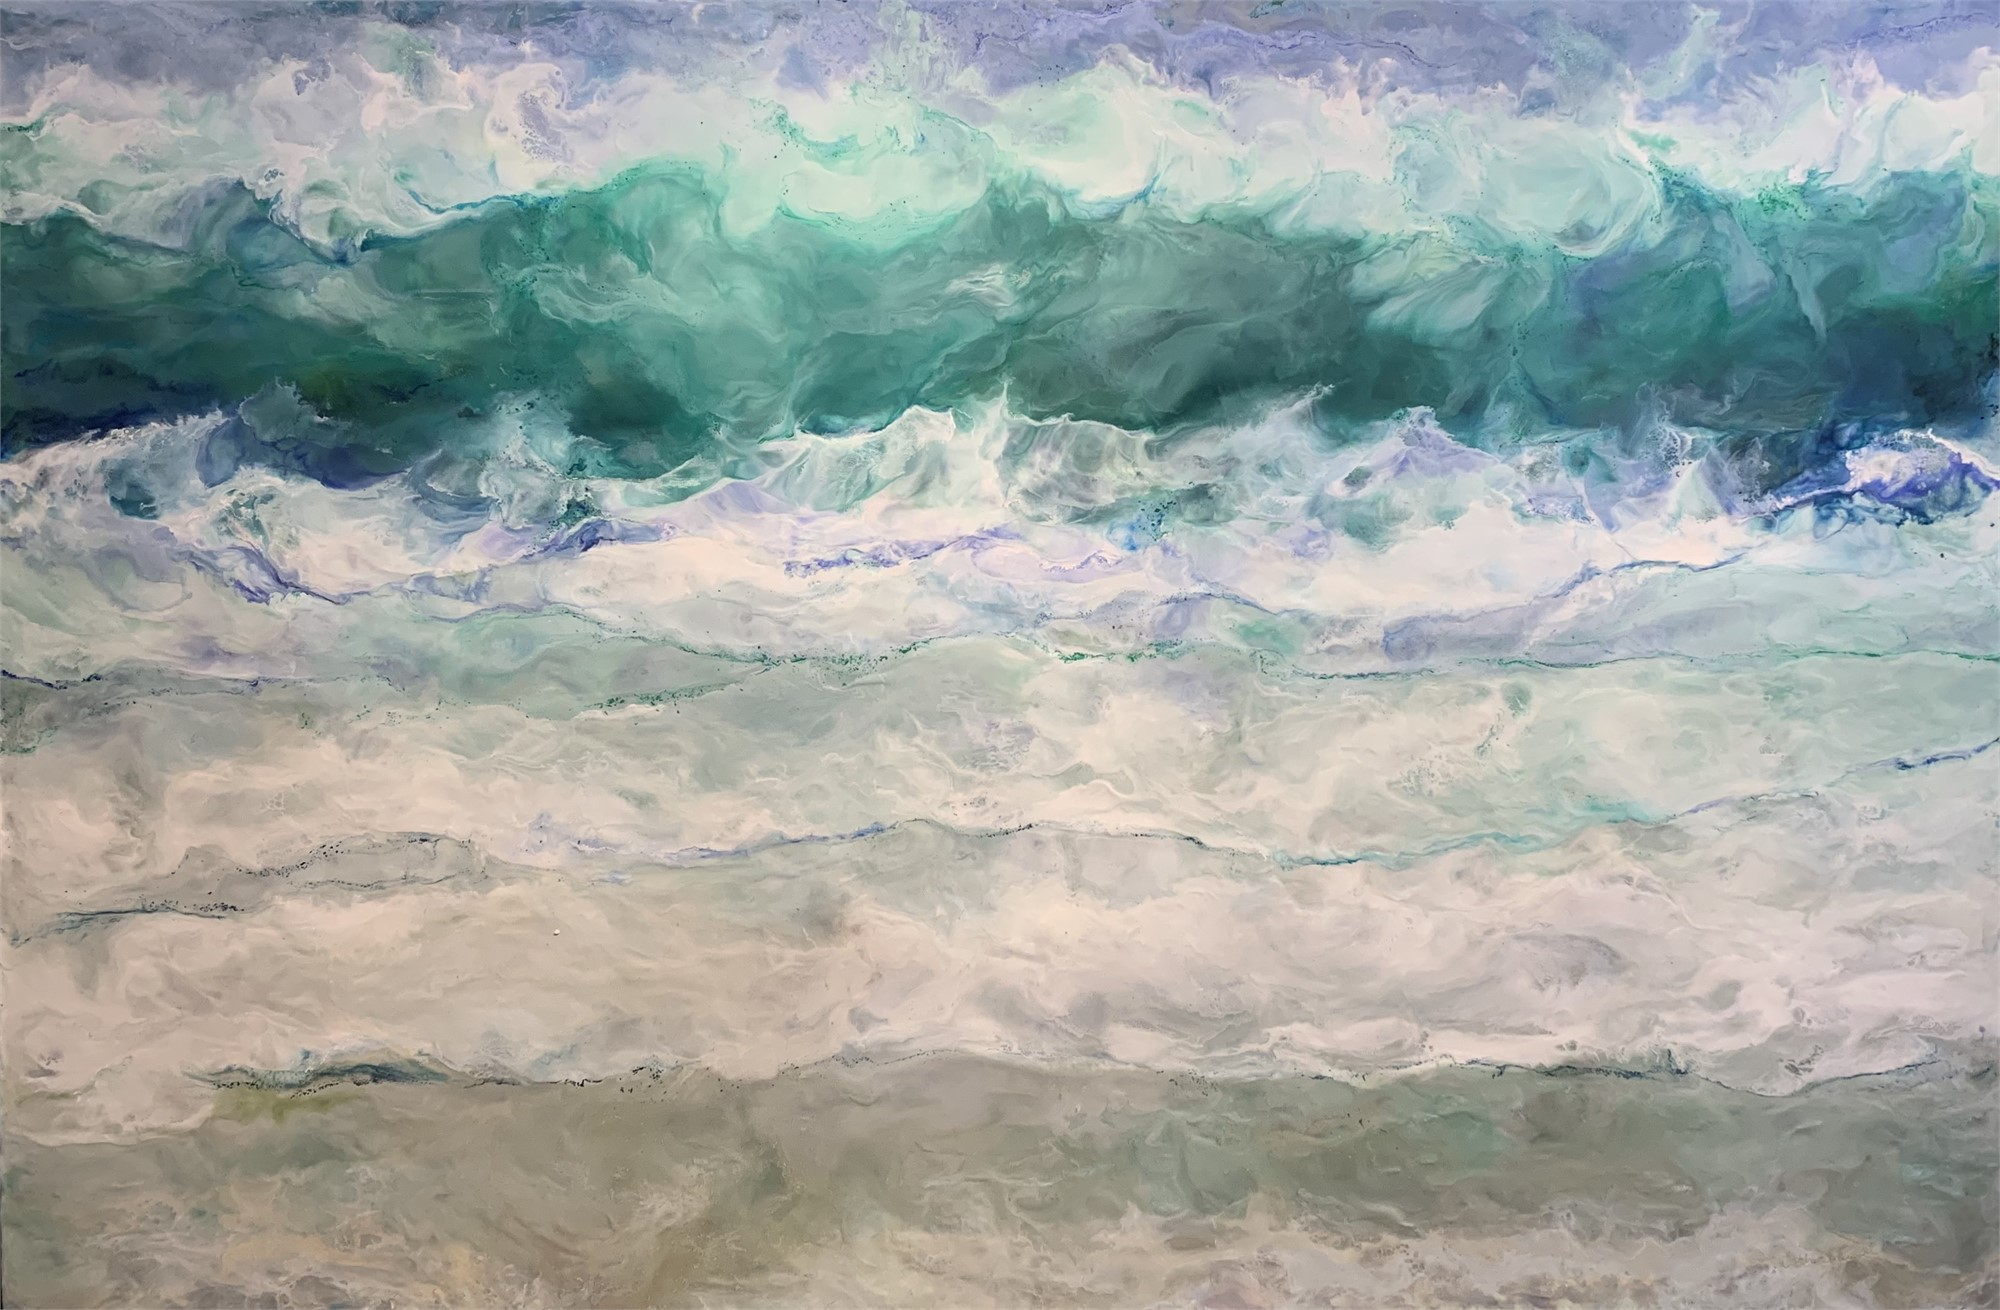 Serendipity by Ruth Hamill